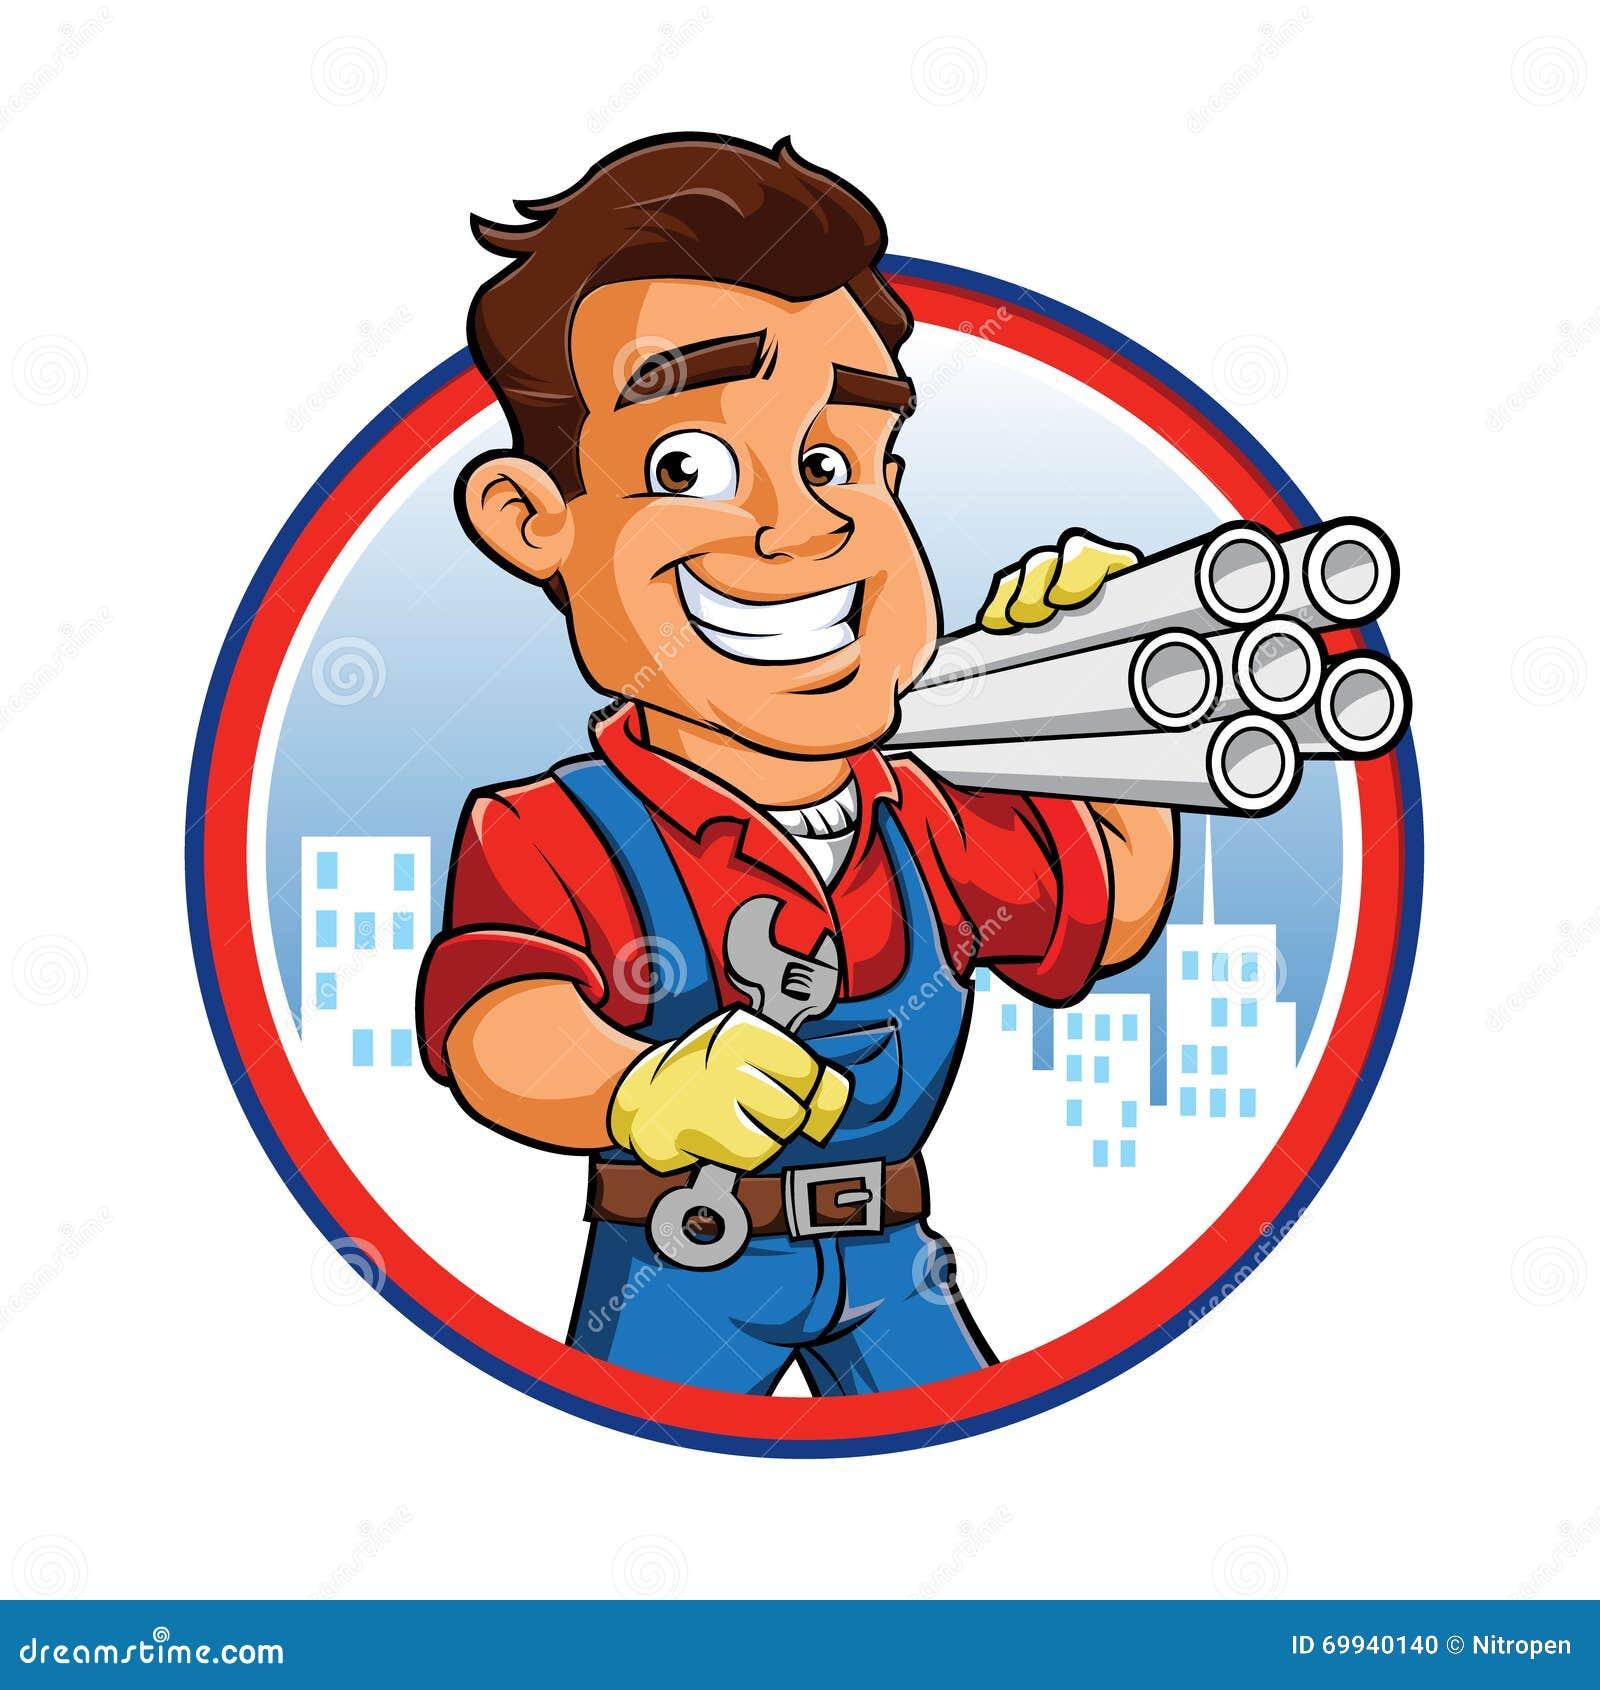 cartoon-plumber-worker-vector-illustration-69940140.jpg